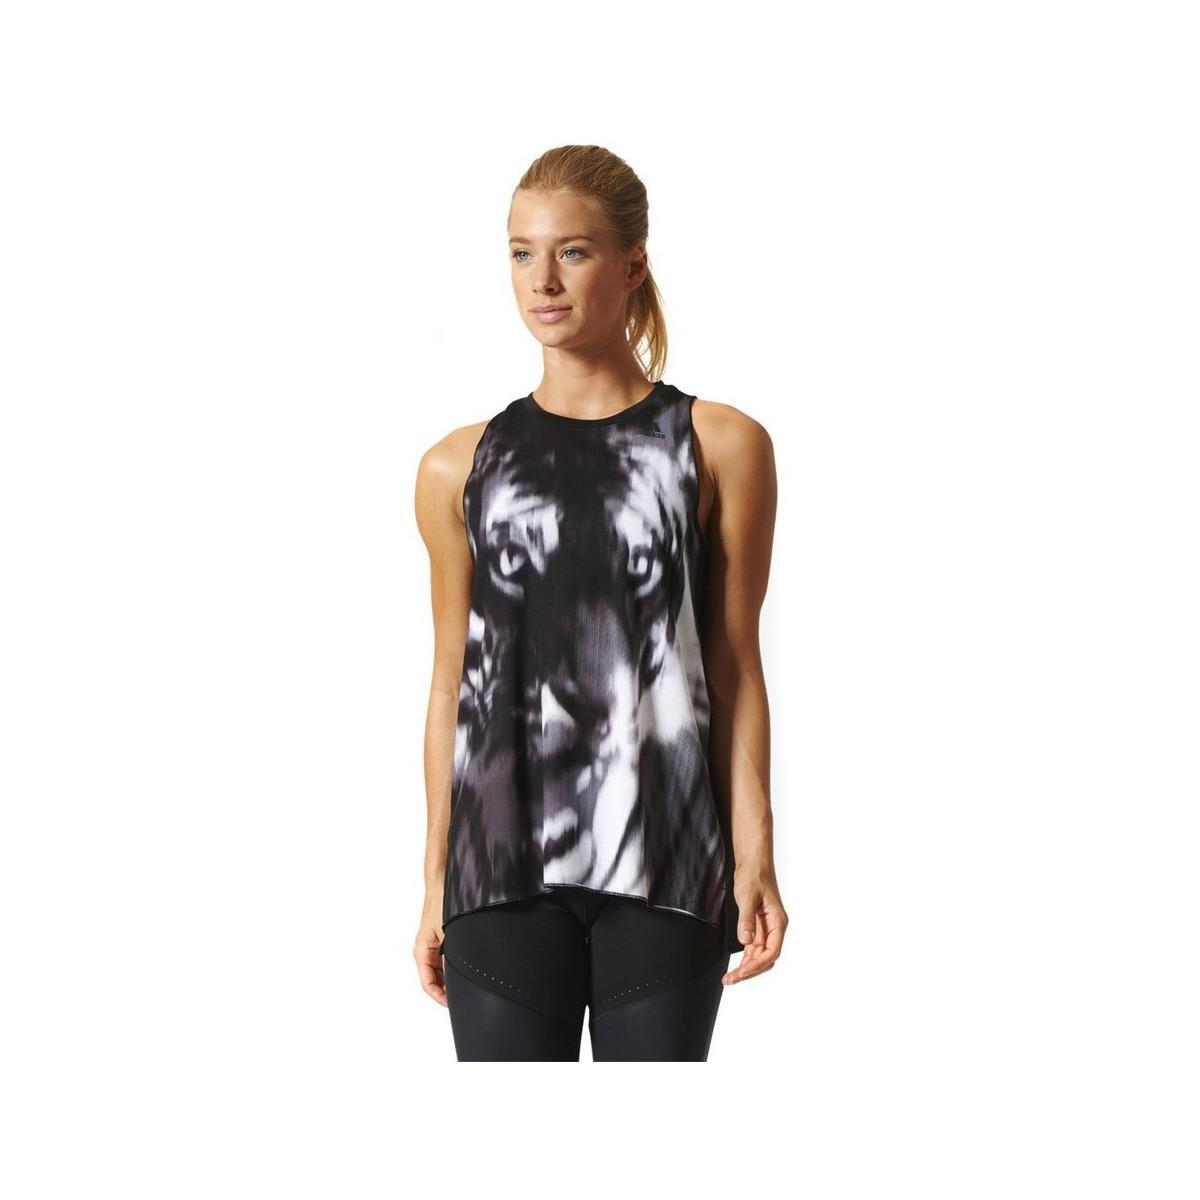 Adidas. Boxy Prime Beast Tank Top Women's Vest Top In Black